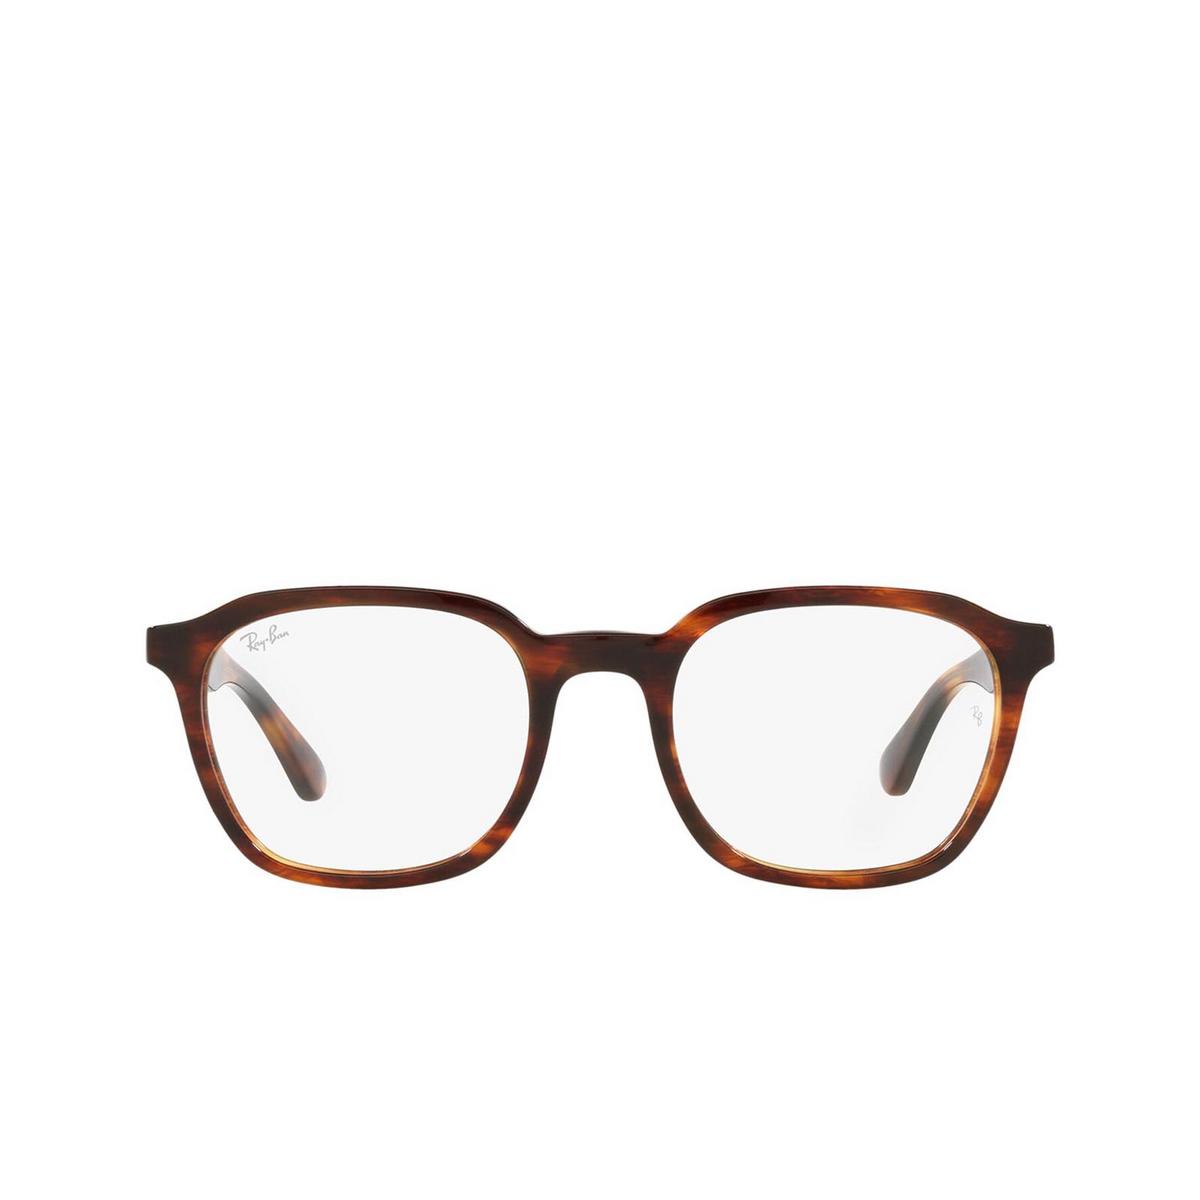 Ray-Ban® Square Eyeglasses: RX5390 color Striped Havana 2144.